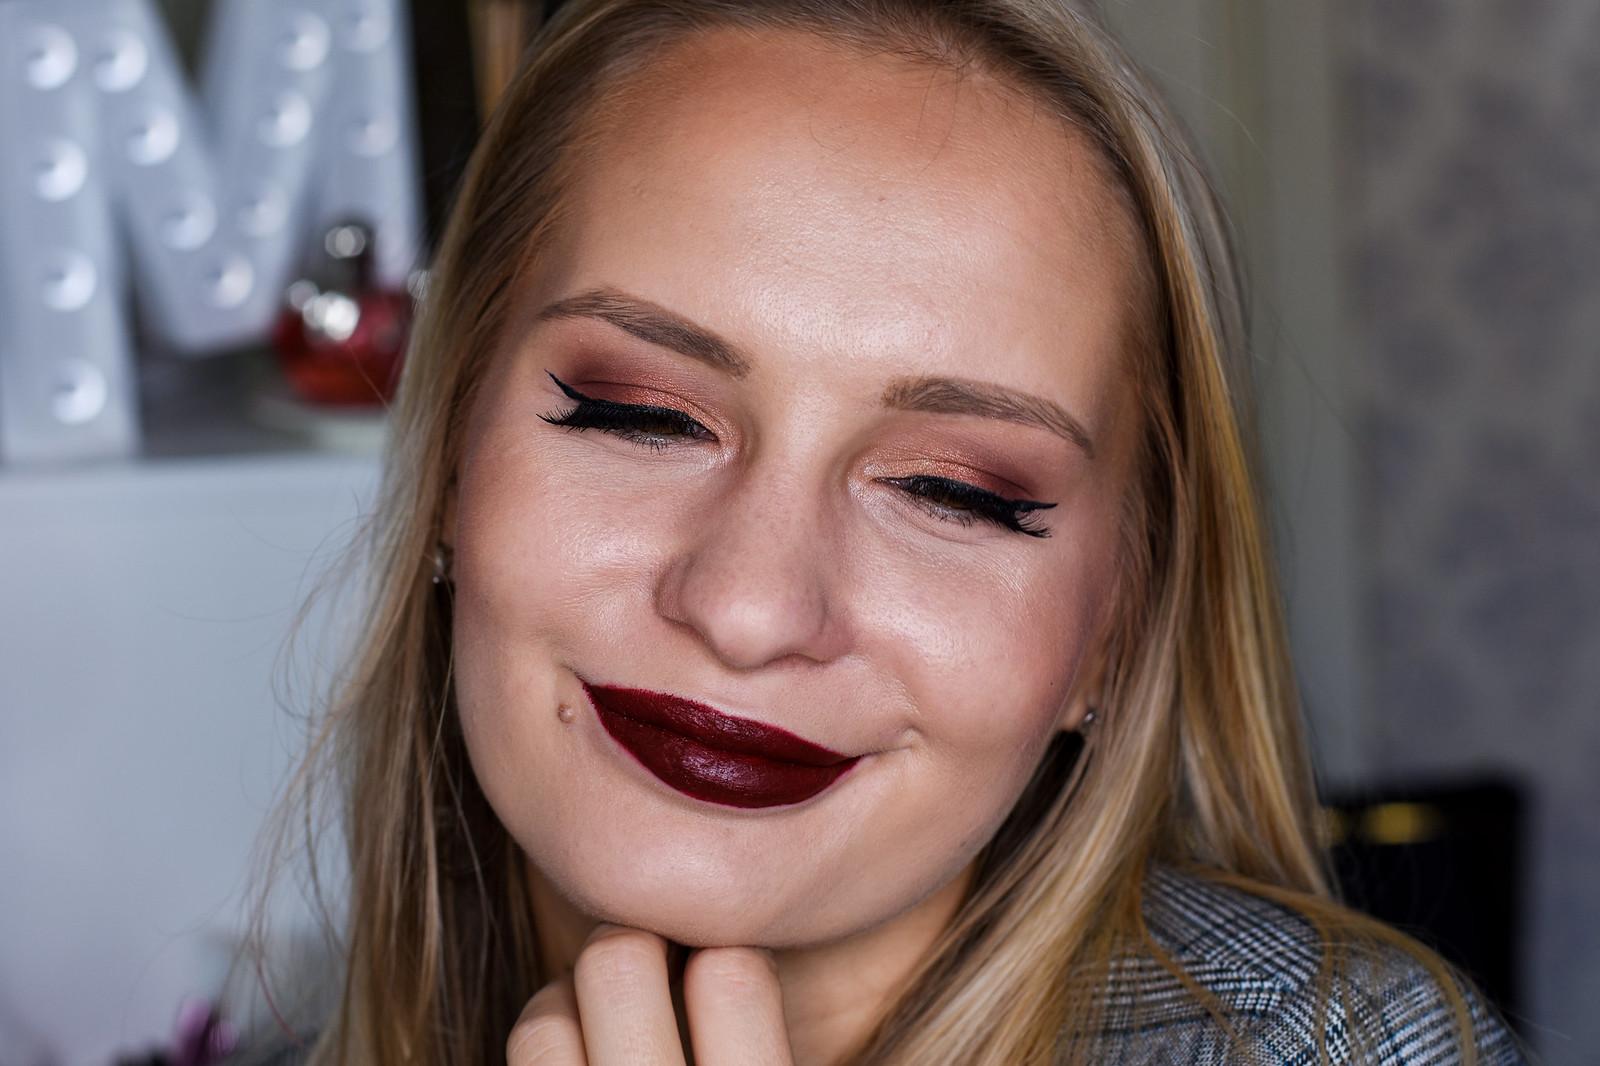 NYX Cosmetics first impressions